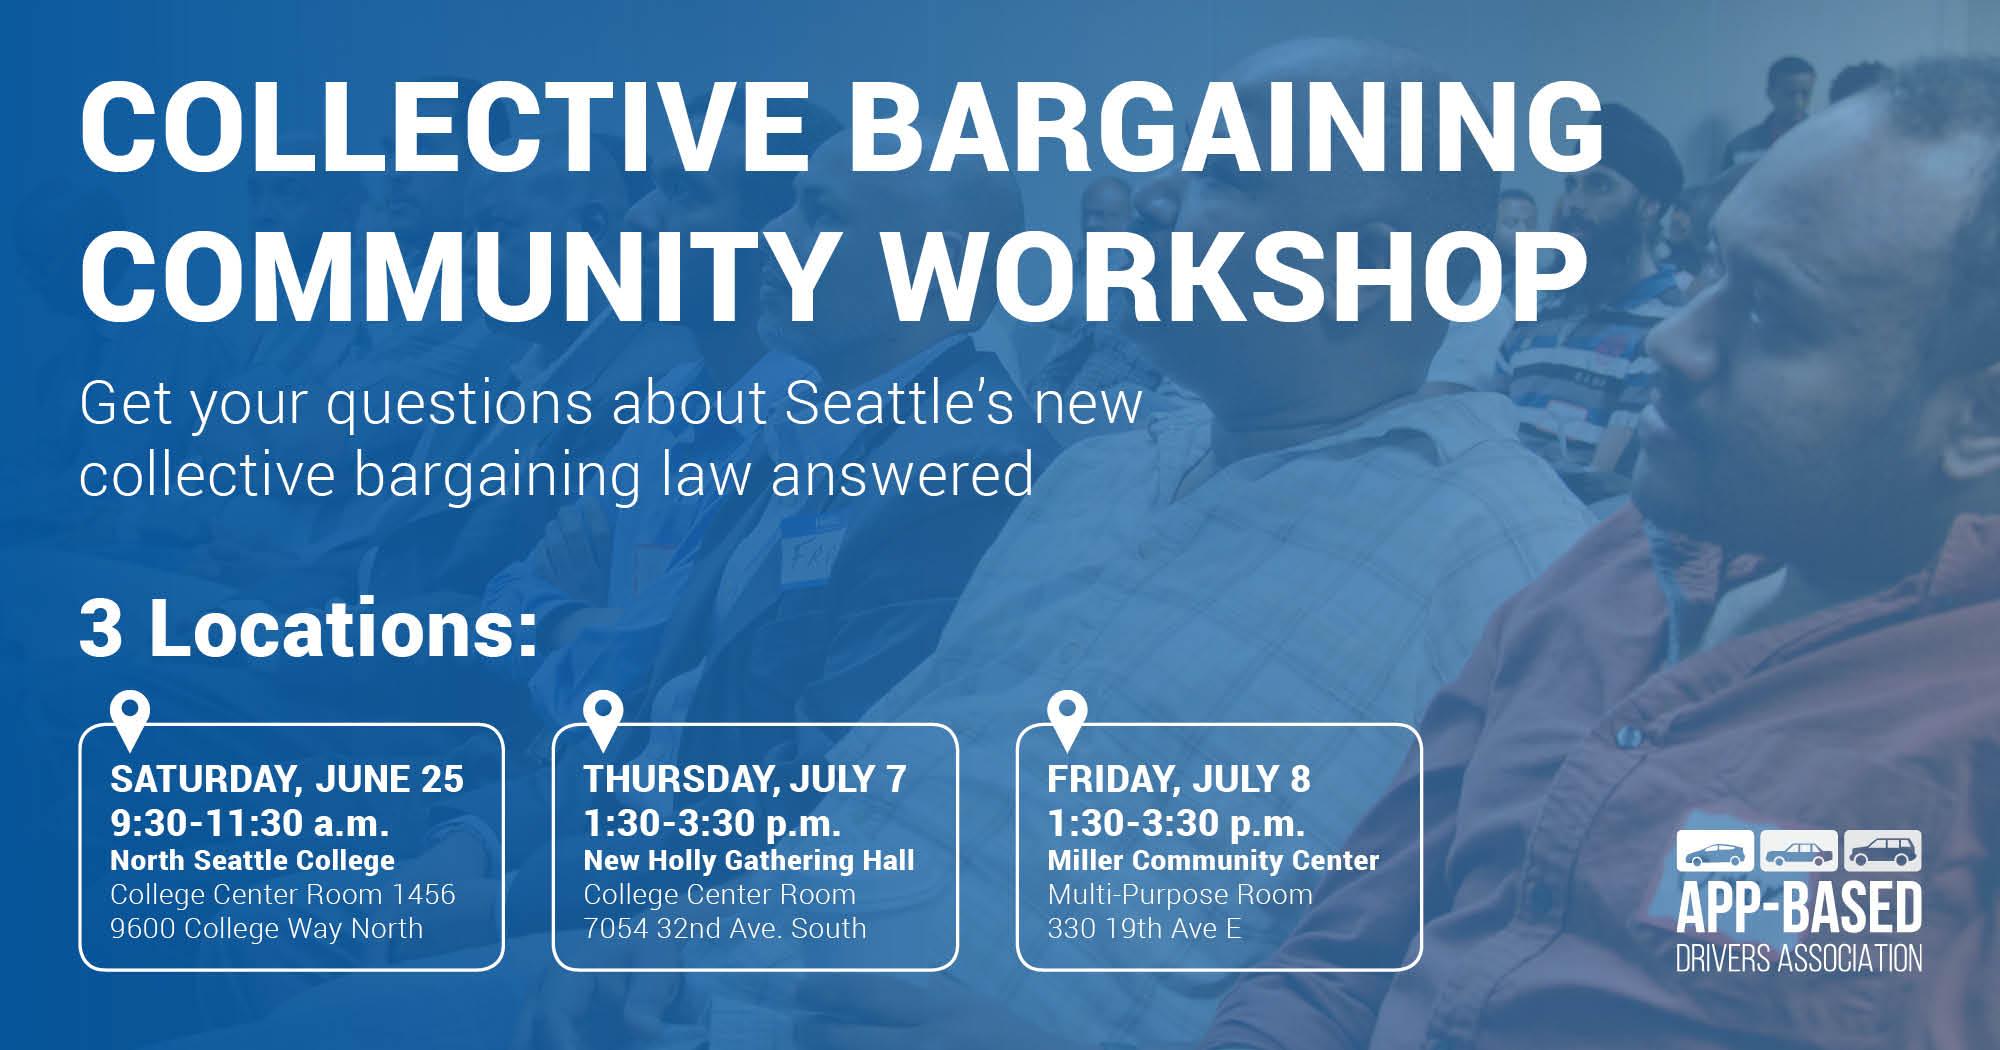 For_Hire_Driver_Collective_Bargaining_Workshop_FB.jpg